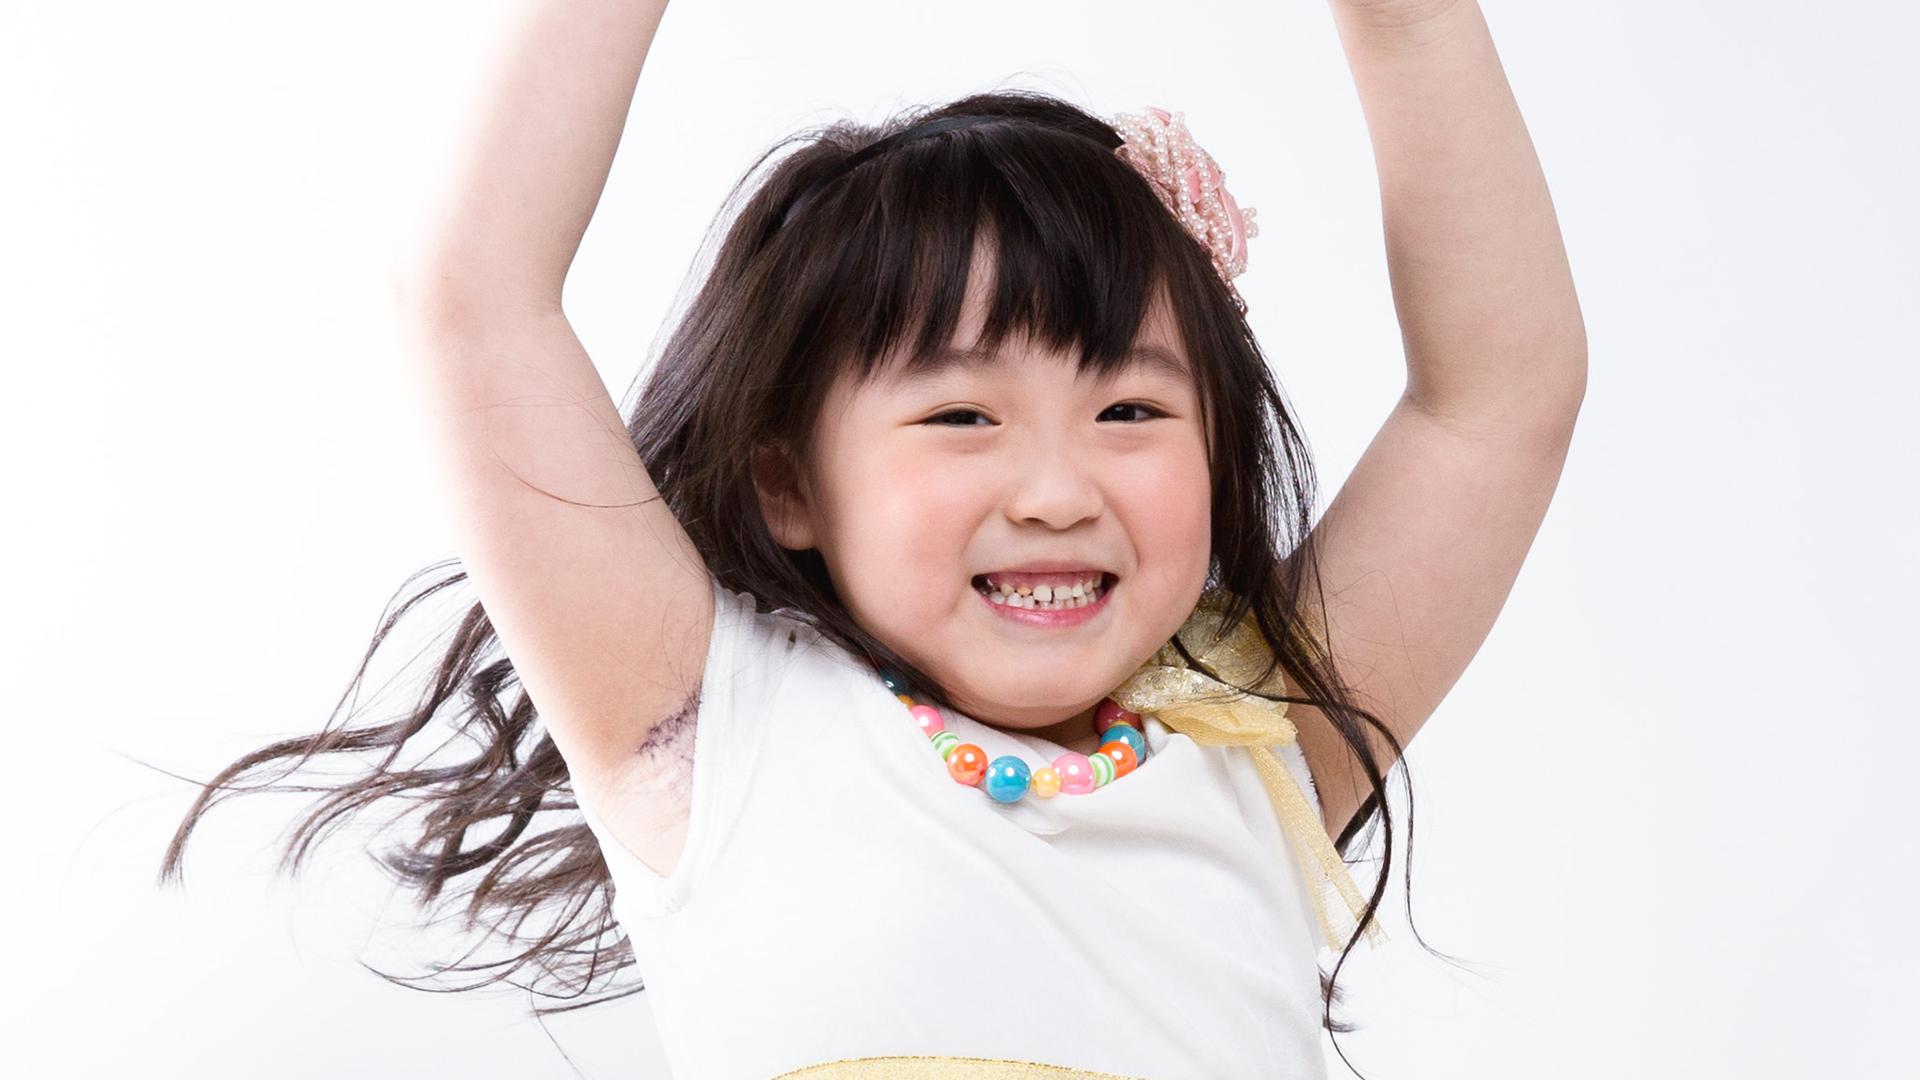 JMJ MODEL_寰星模特兒經紀_黃湘潁_Mimmy_童星